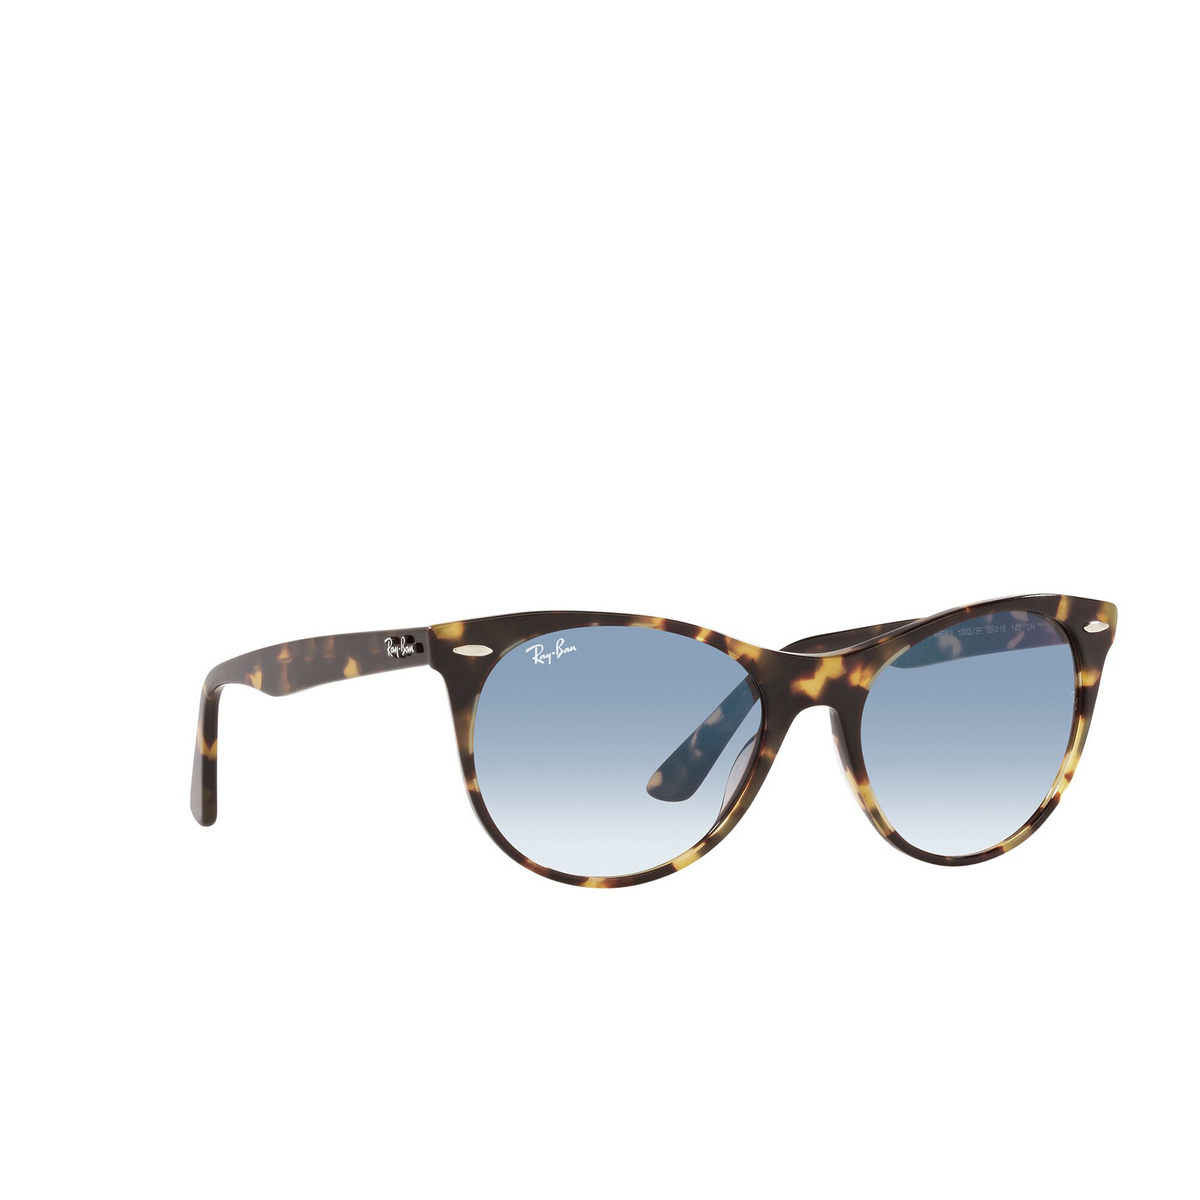 Ray-Ban® Round Sunglasses: Wayfarer Ii RB2185 color Yellow Havana 13323F - three-quarters view.